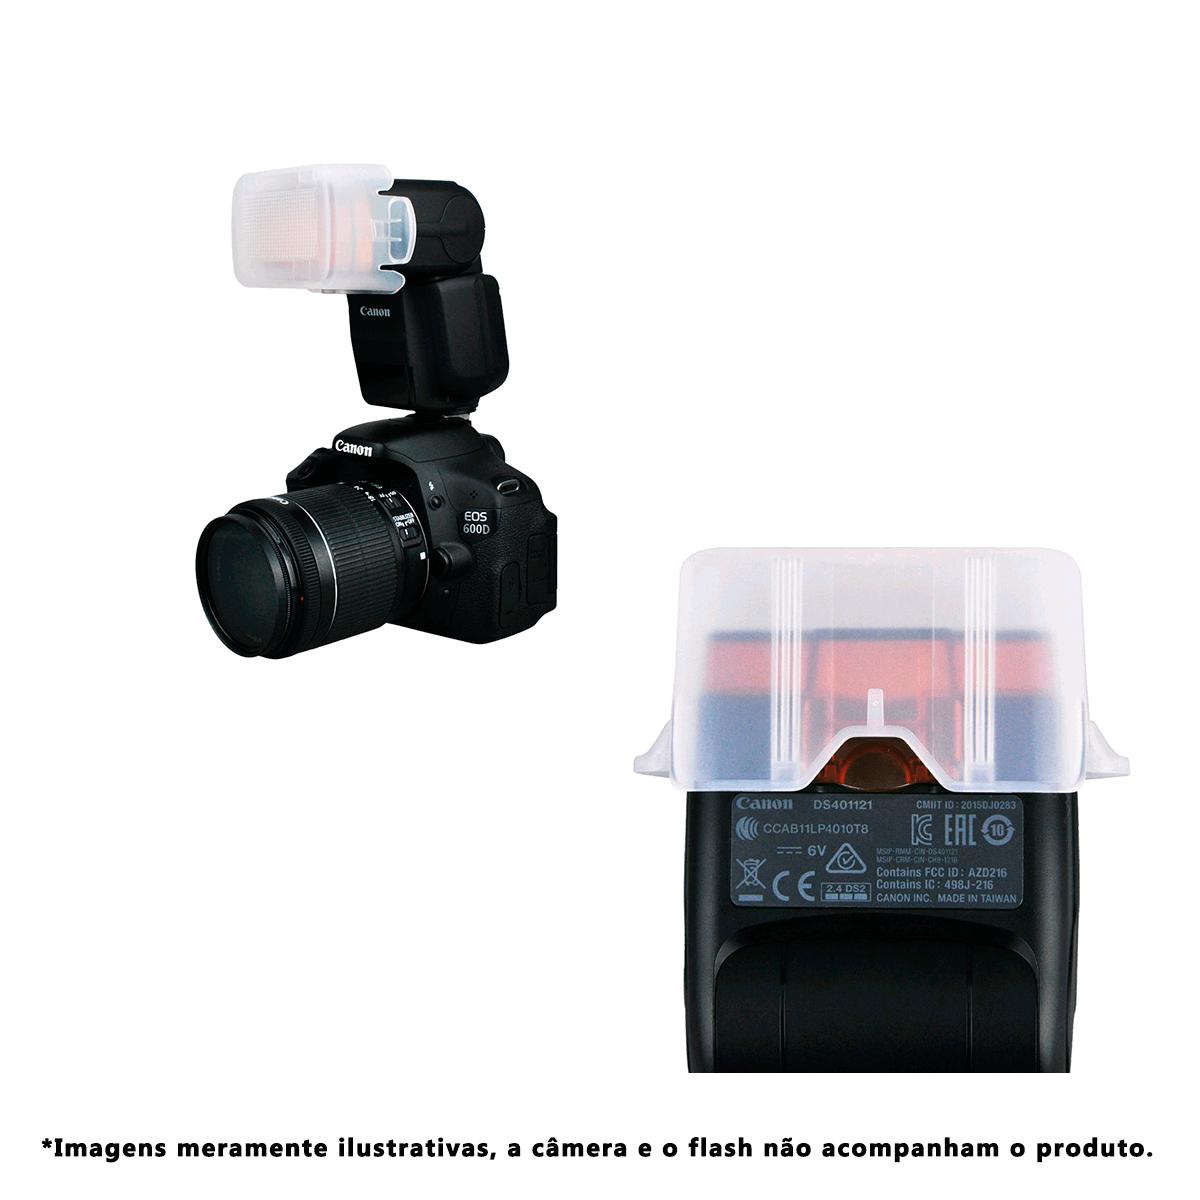 Difusor Plástico tipo Copo JJC FC-430EXIII para Flash Speedlite Canon 430EX III-RT  - Fotolux